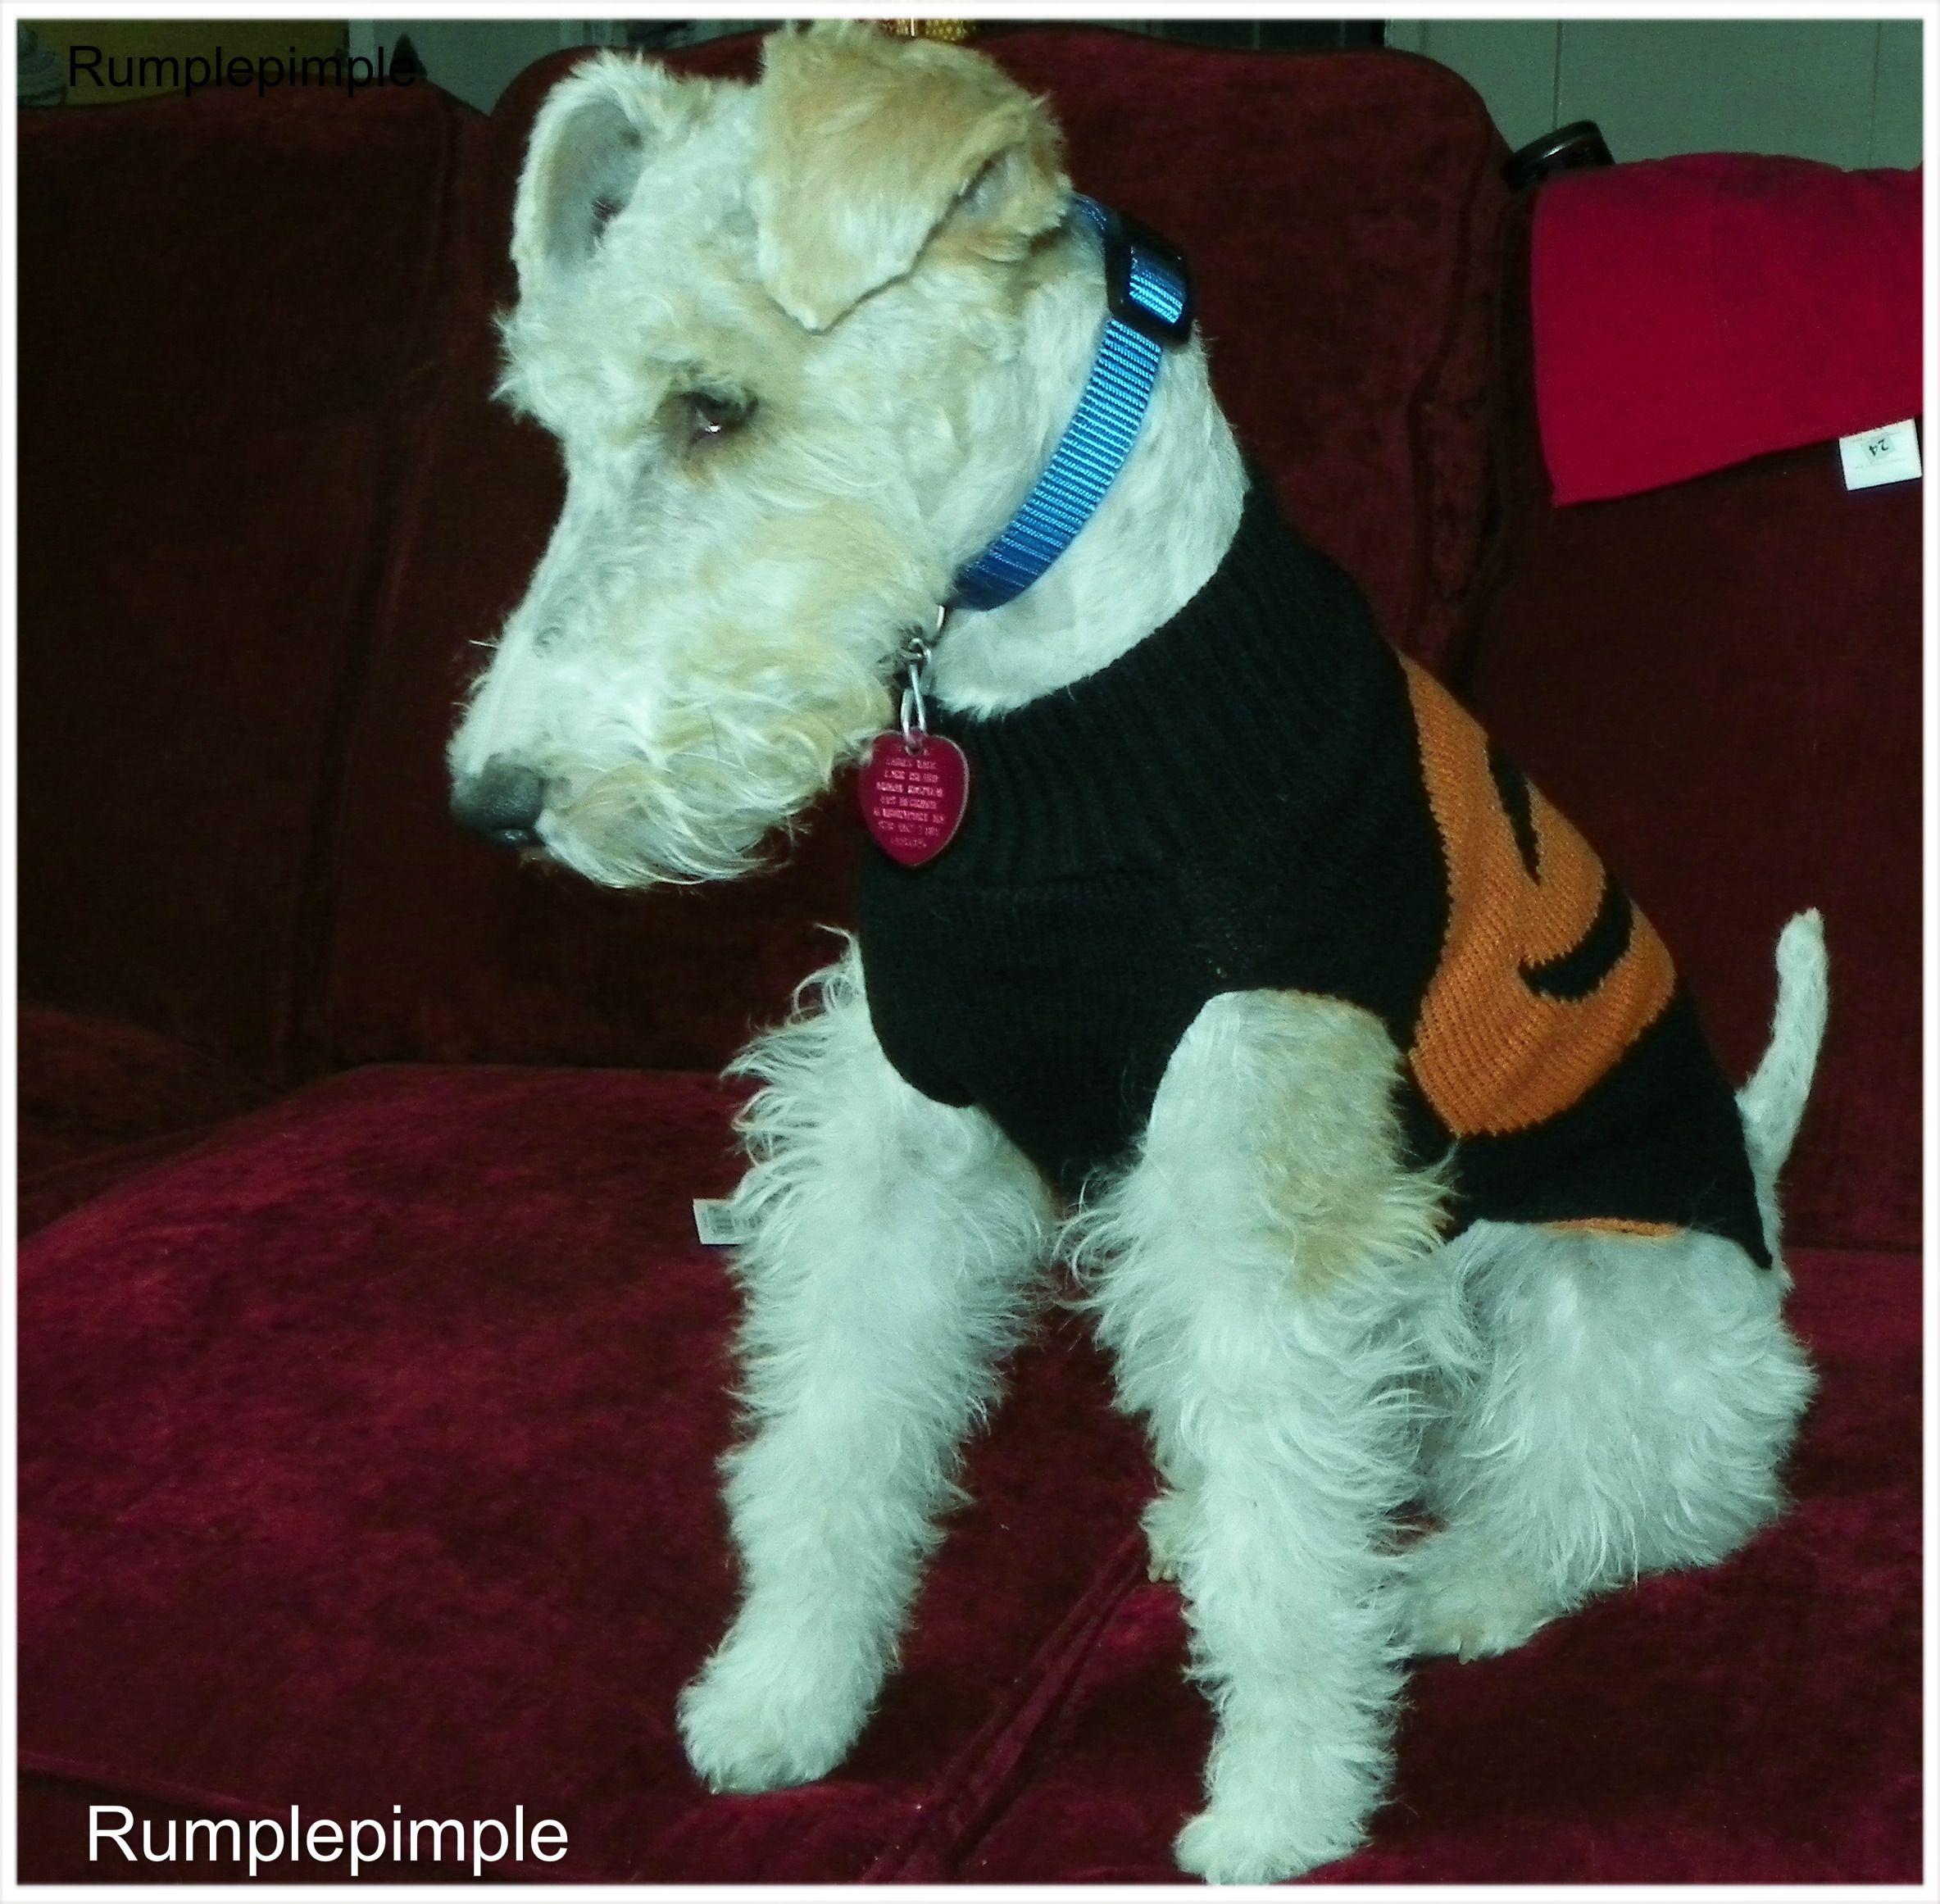 Wire Fox Terrier Rumplepimple